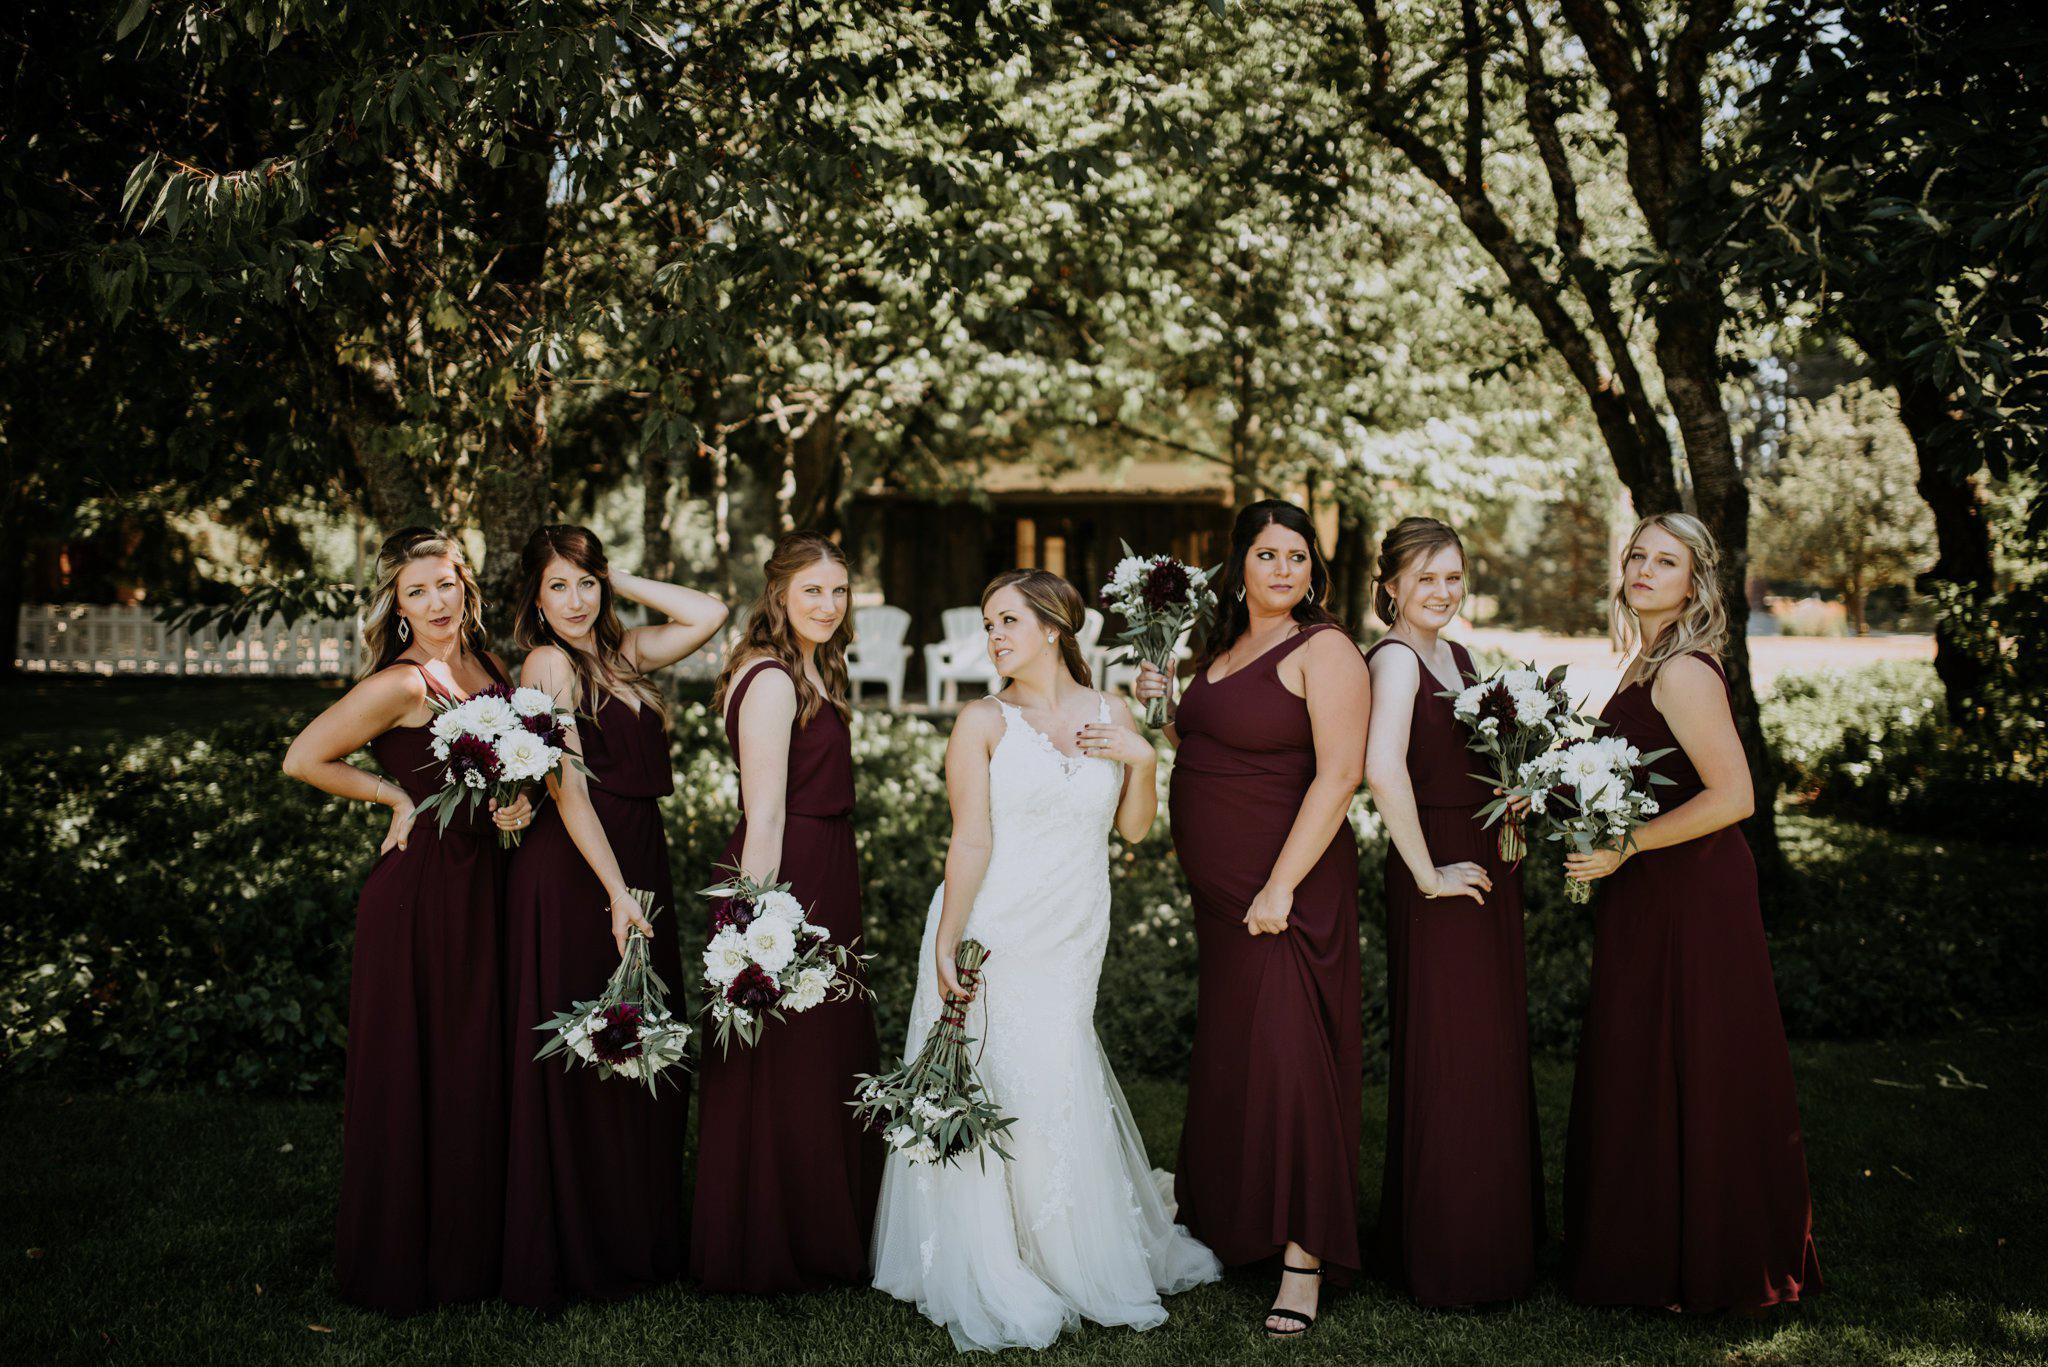 kristen-and-cody-the-kelley-farm-wedding-seattle-photographer-caitlyn-nikula-37.jpg